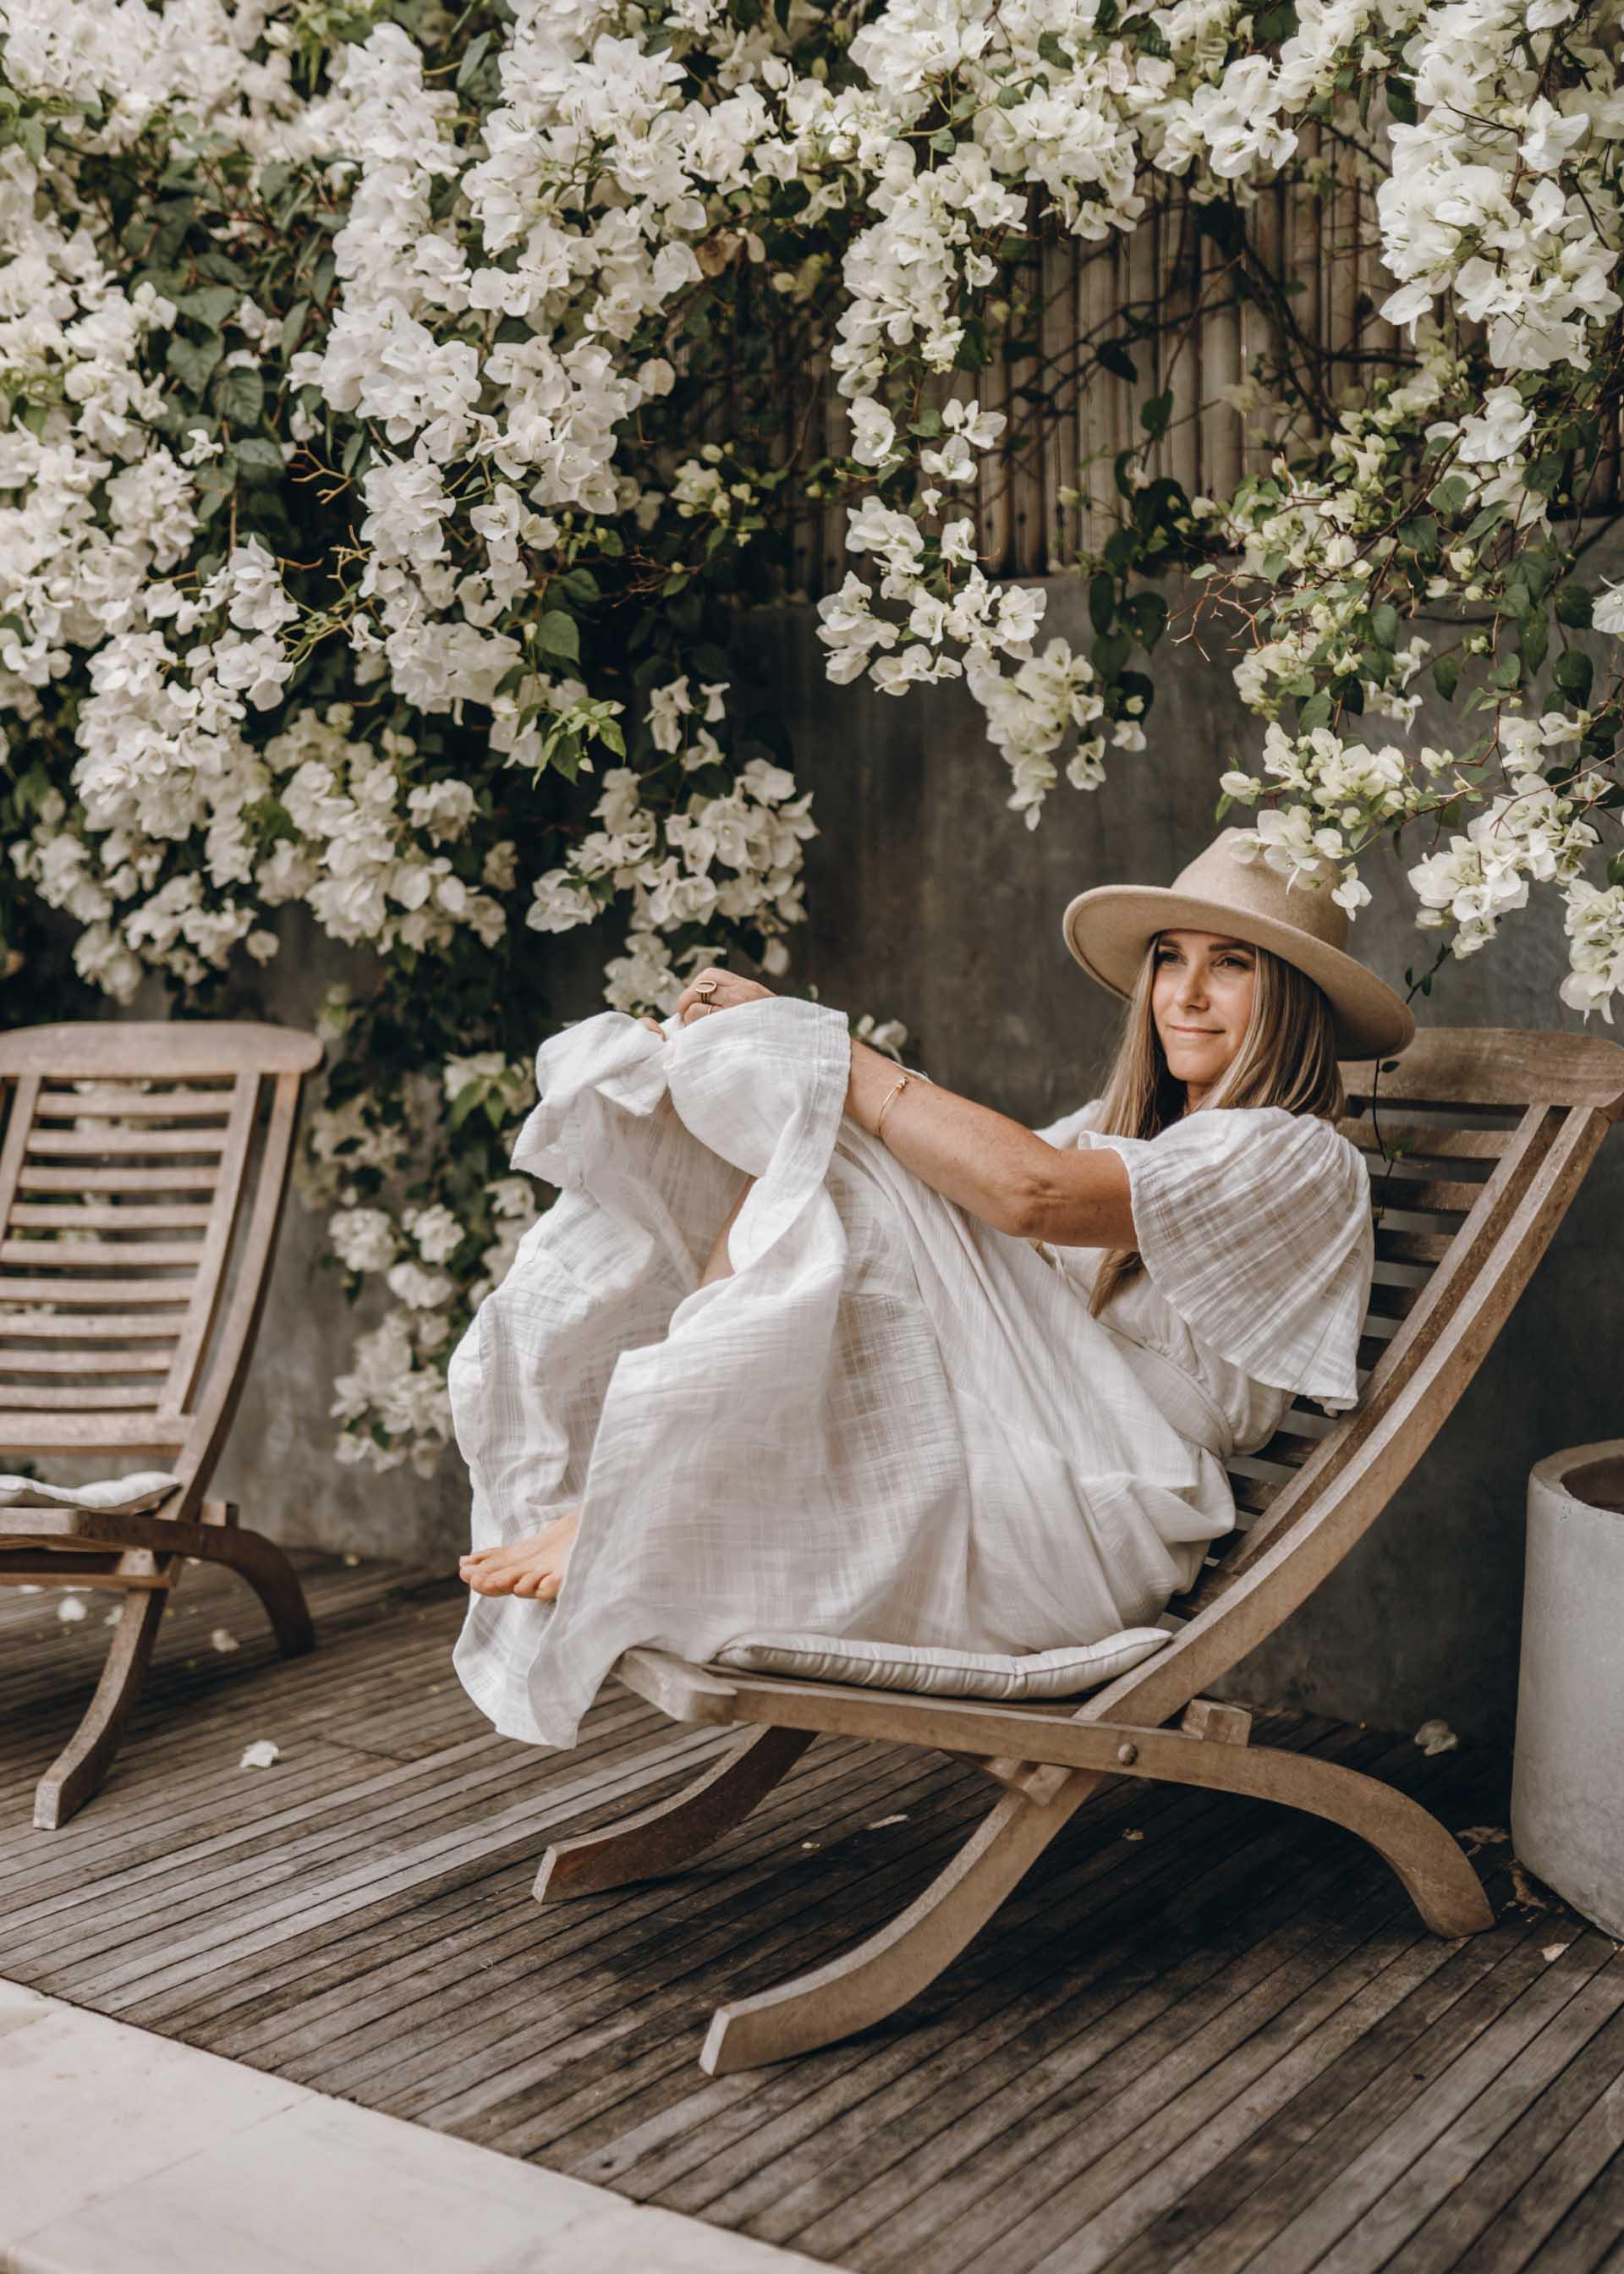 keira-mason-bird-and-kite-white-dress-garden-goals.jpg